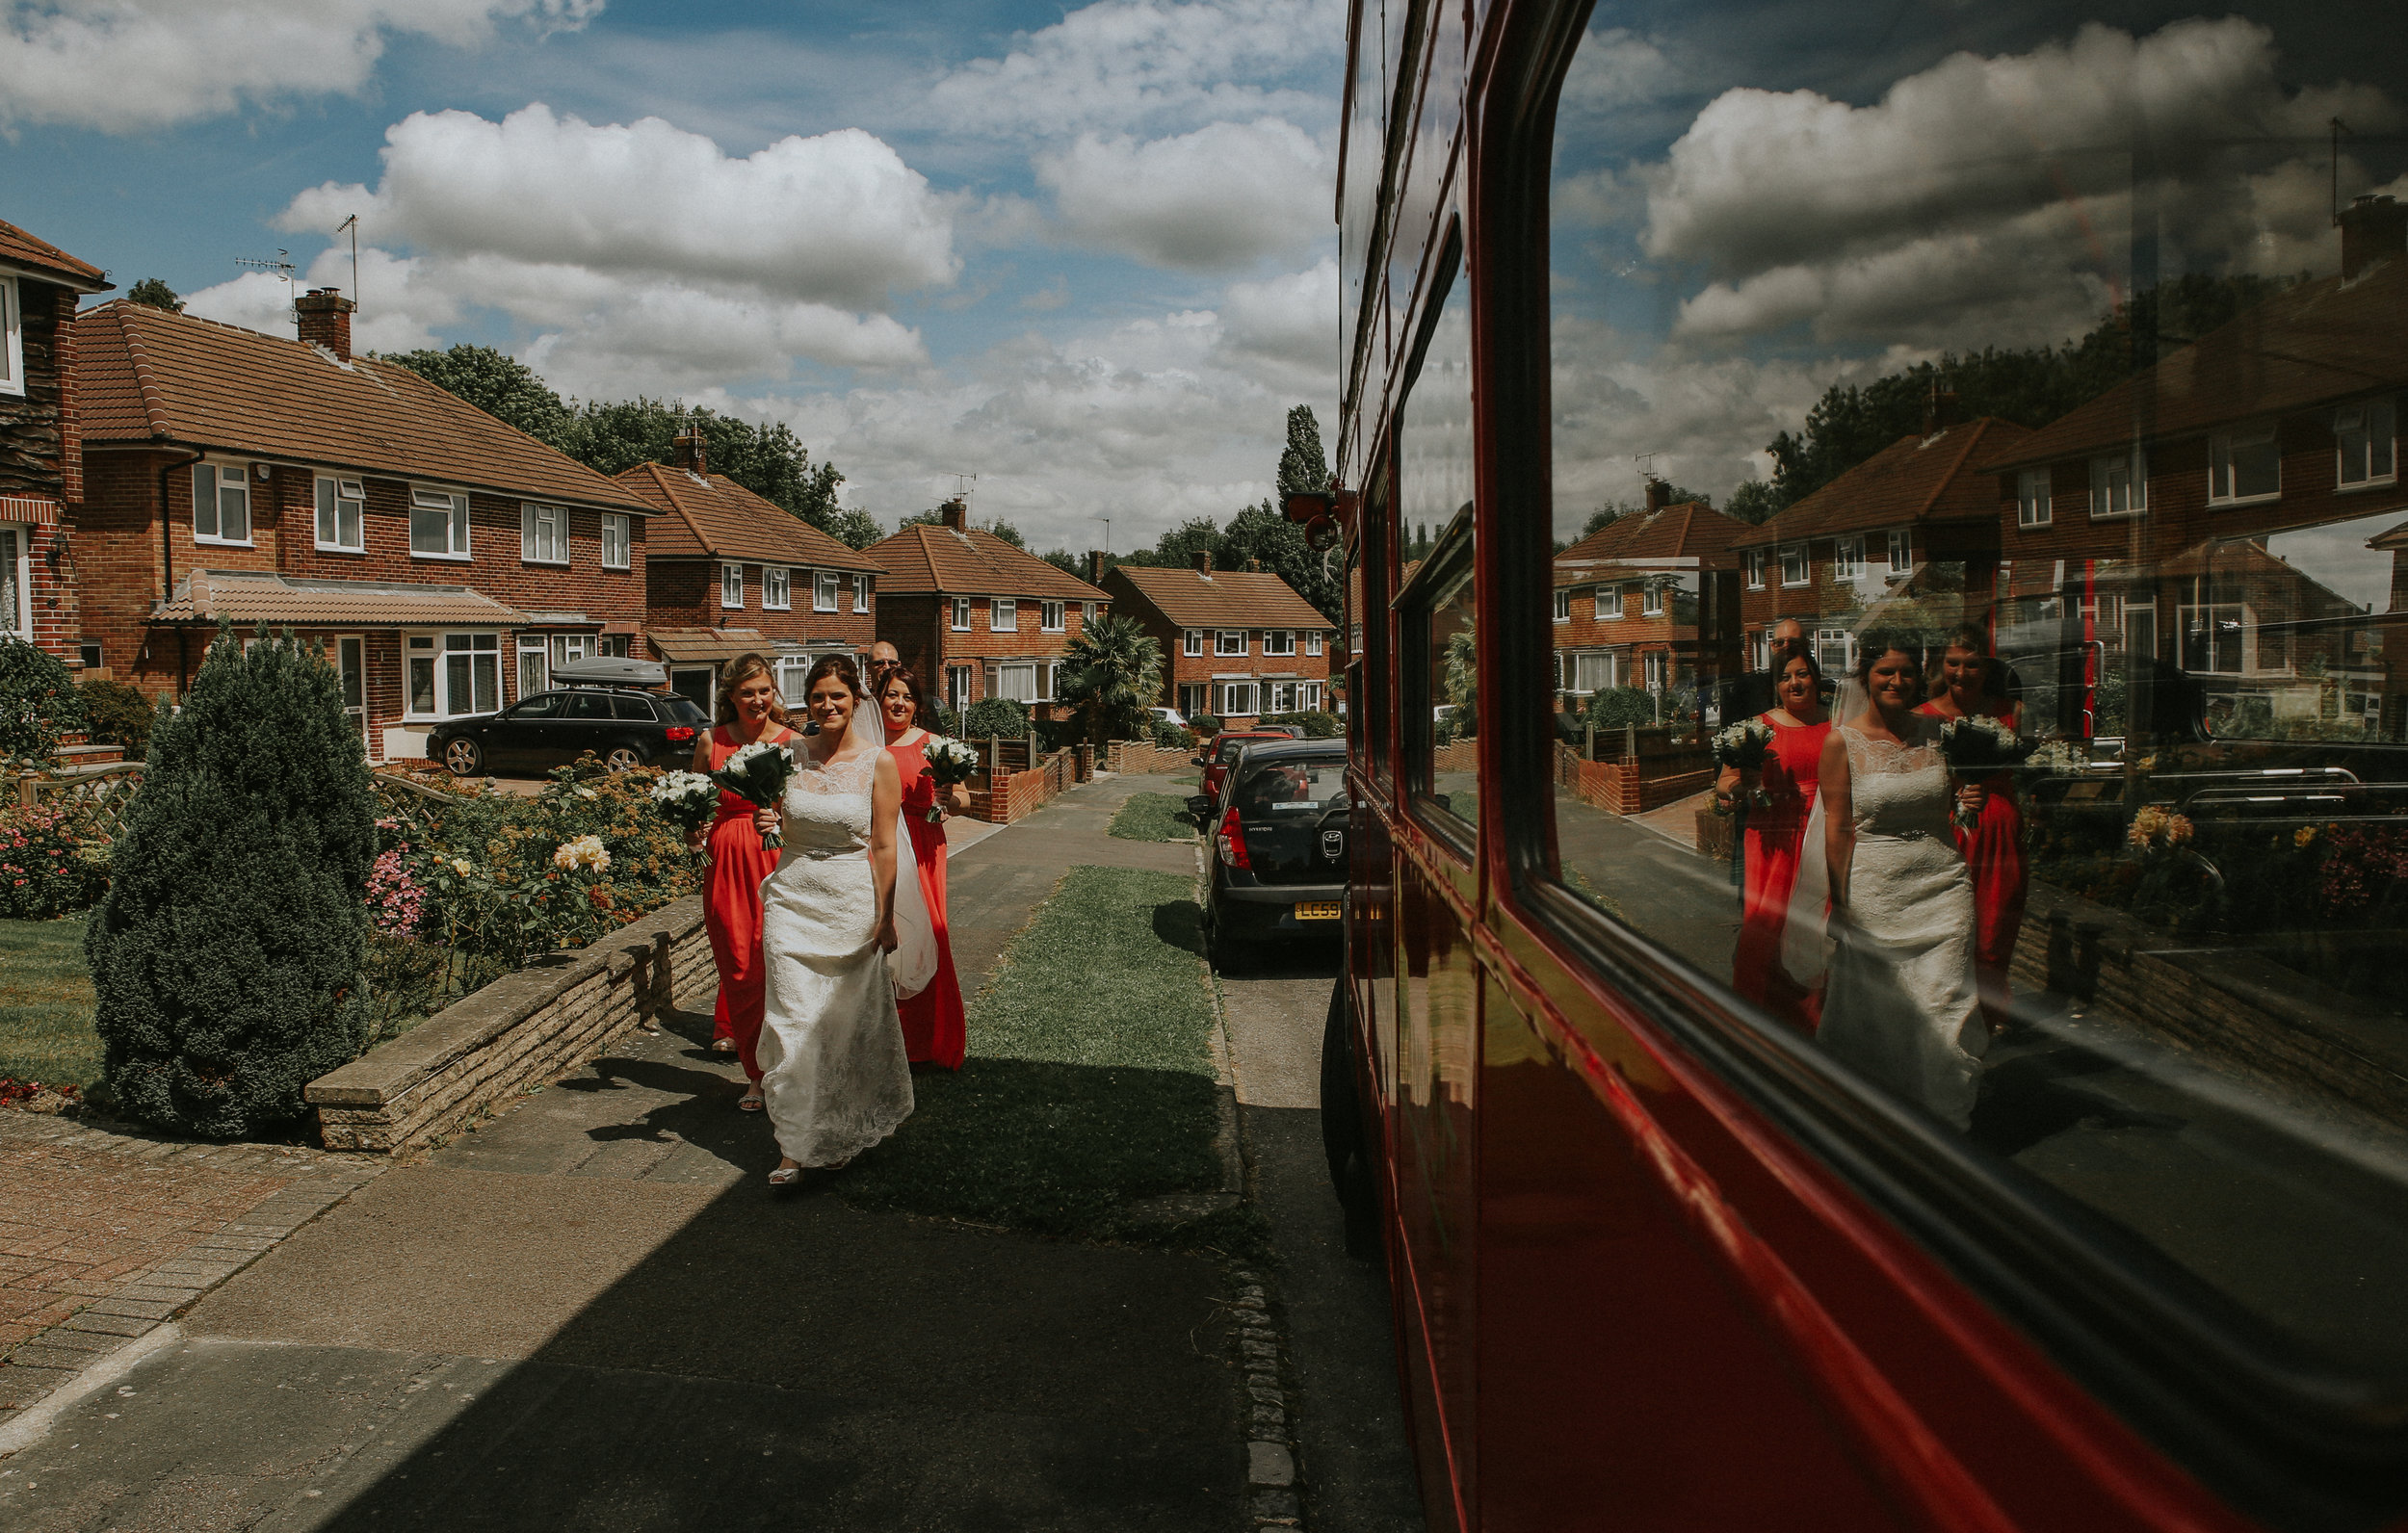 reigate-surrey-london-wedding-photography-bridal-prep-routemaster-bus-21